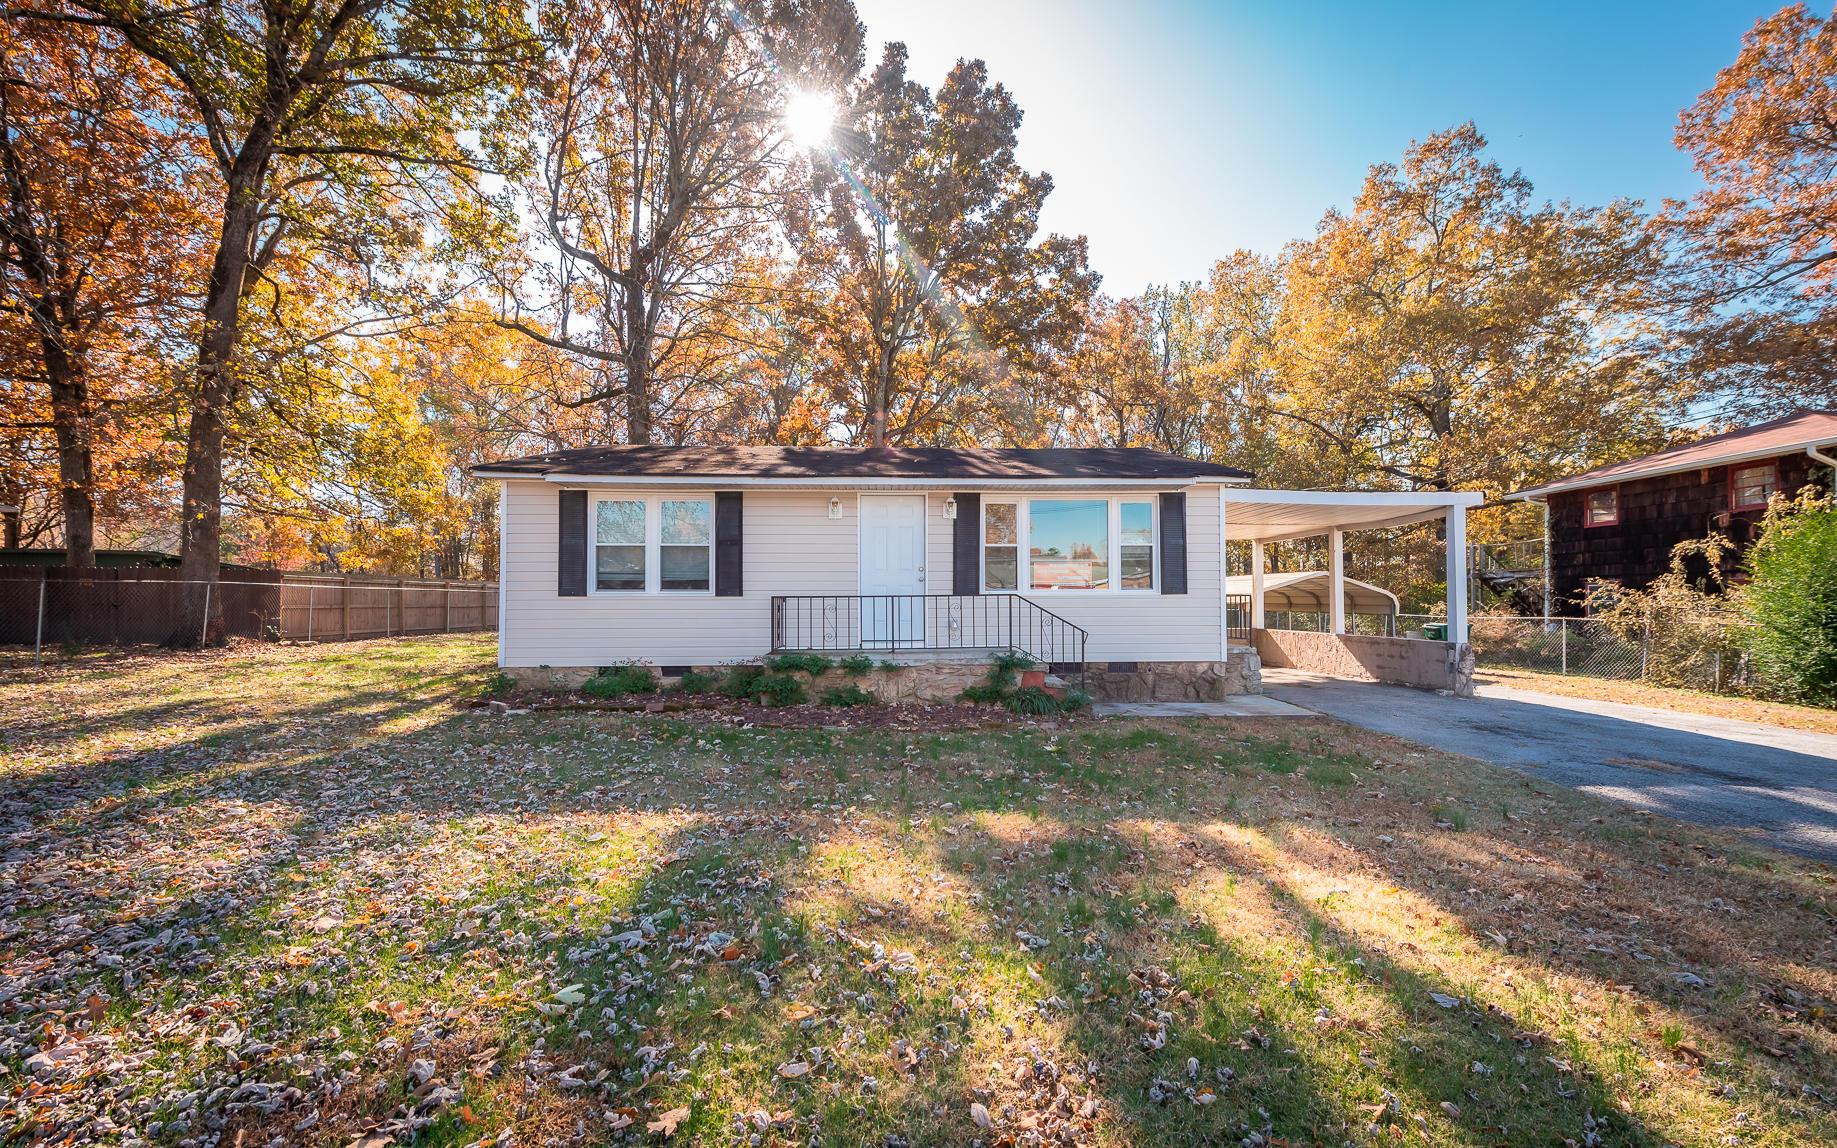 8342 Iris Rd, Chattanooga, TN 37421